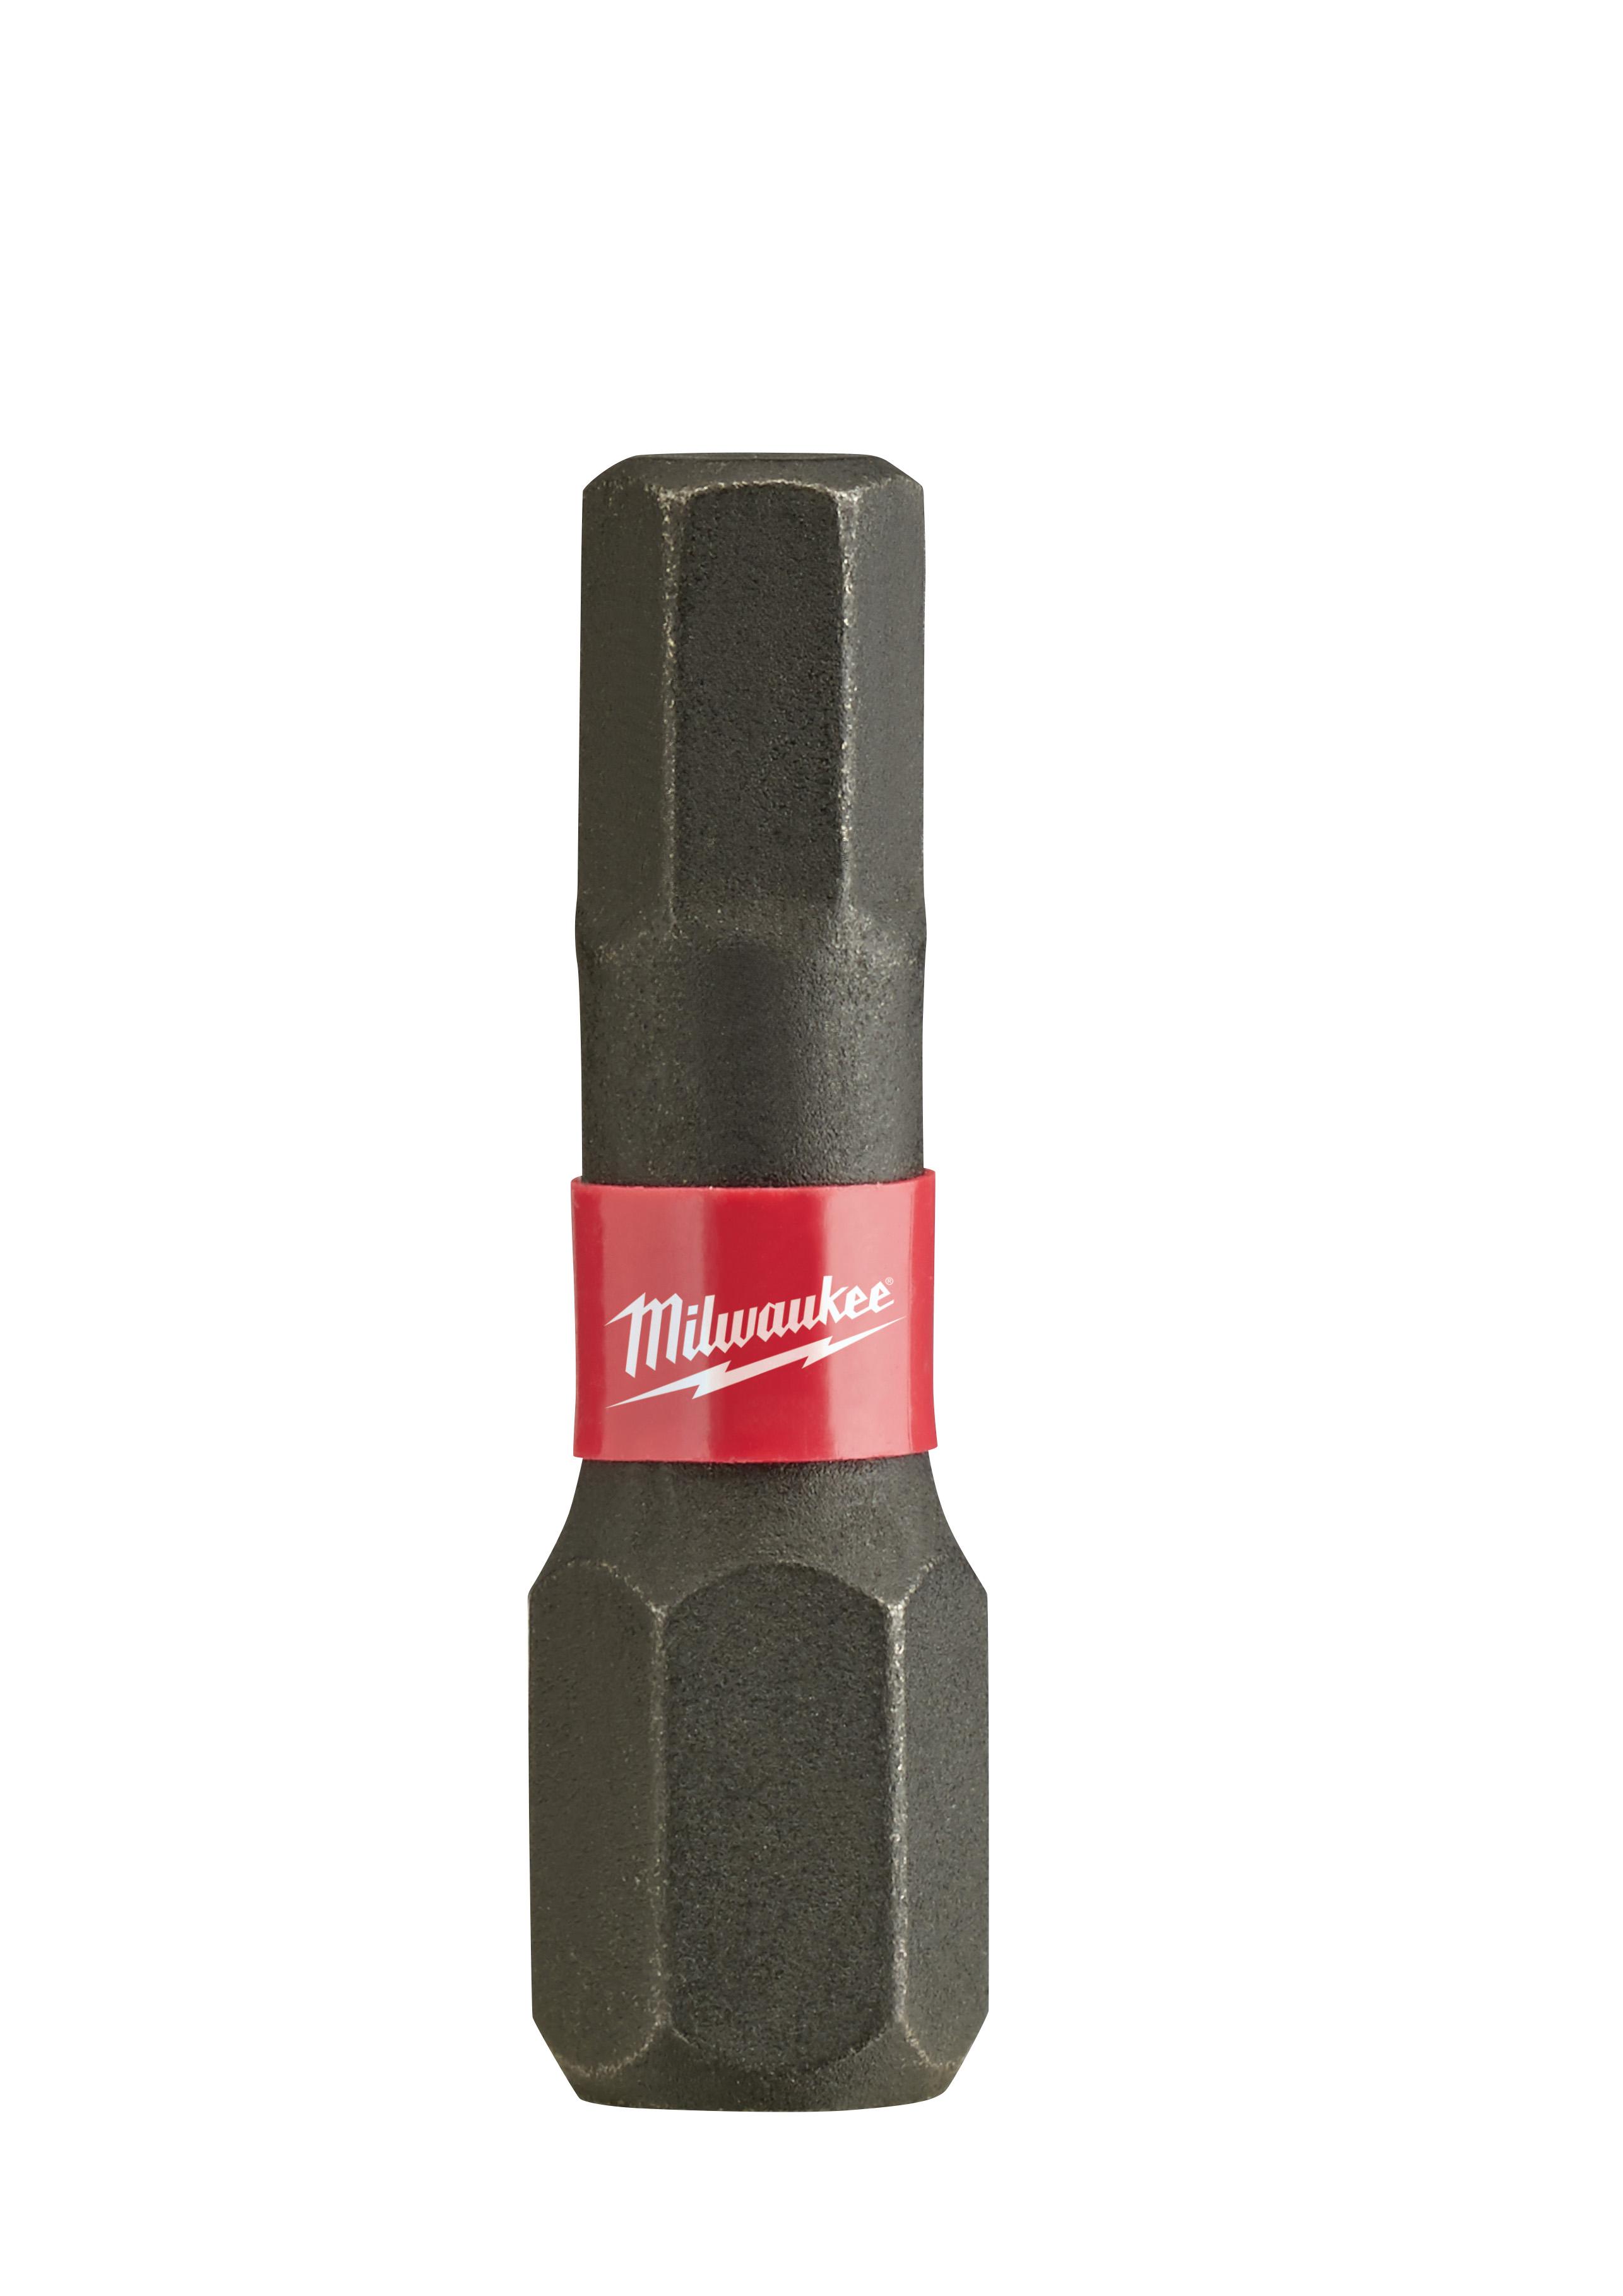 Milwaukee® SHOCKWAVE™ 48-32-4727 Impact Insert Bit, 5 mm Hex Point, 1 in OAL, Custom Alloy76™ Steel